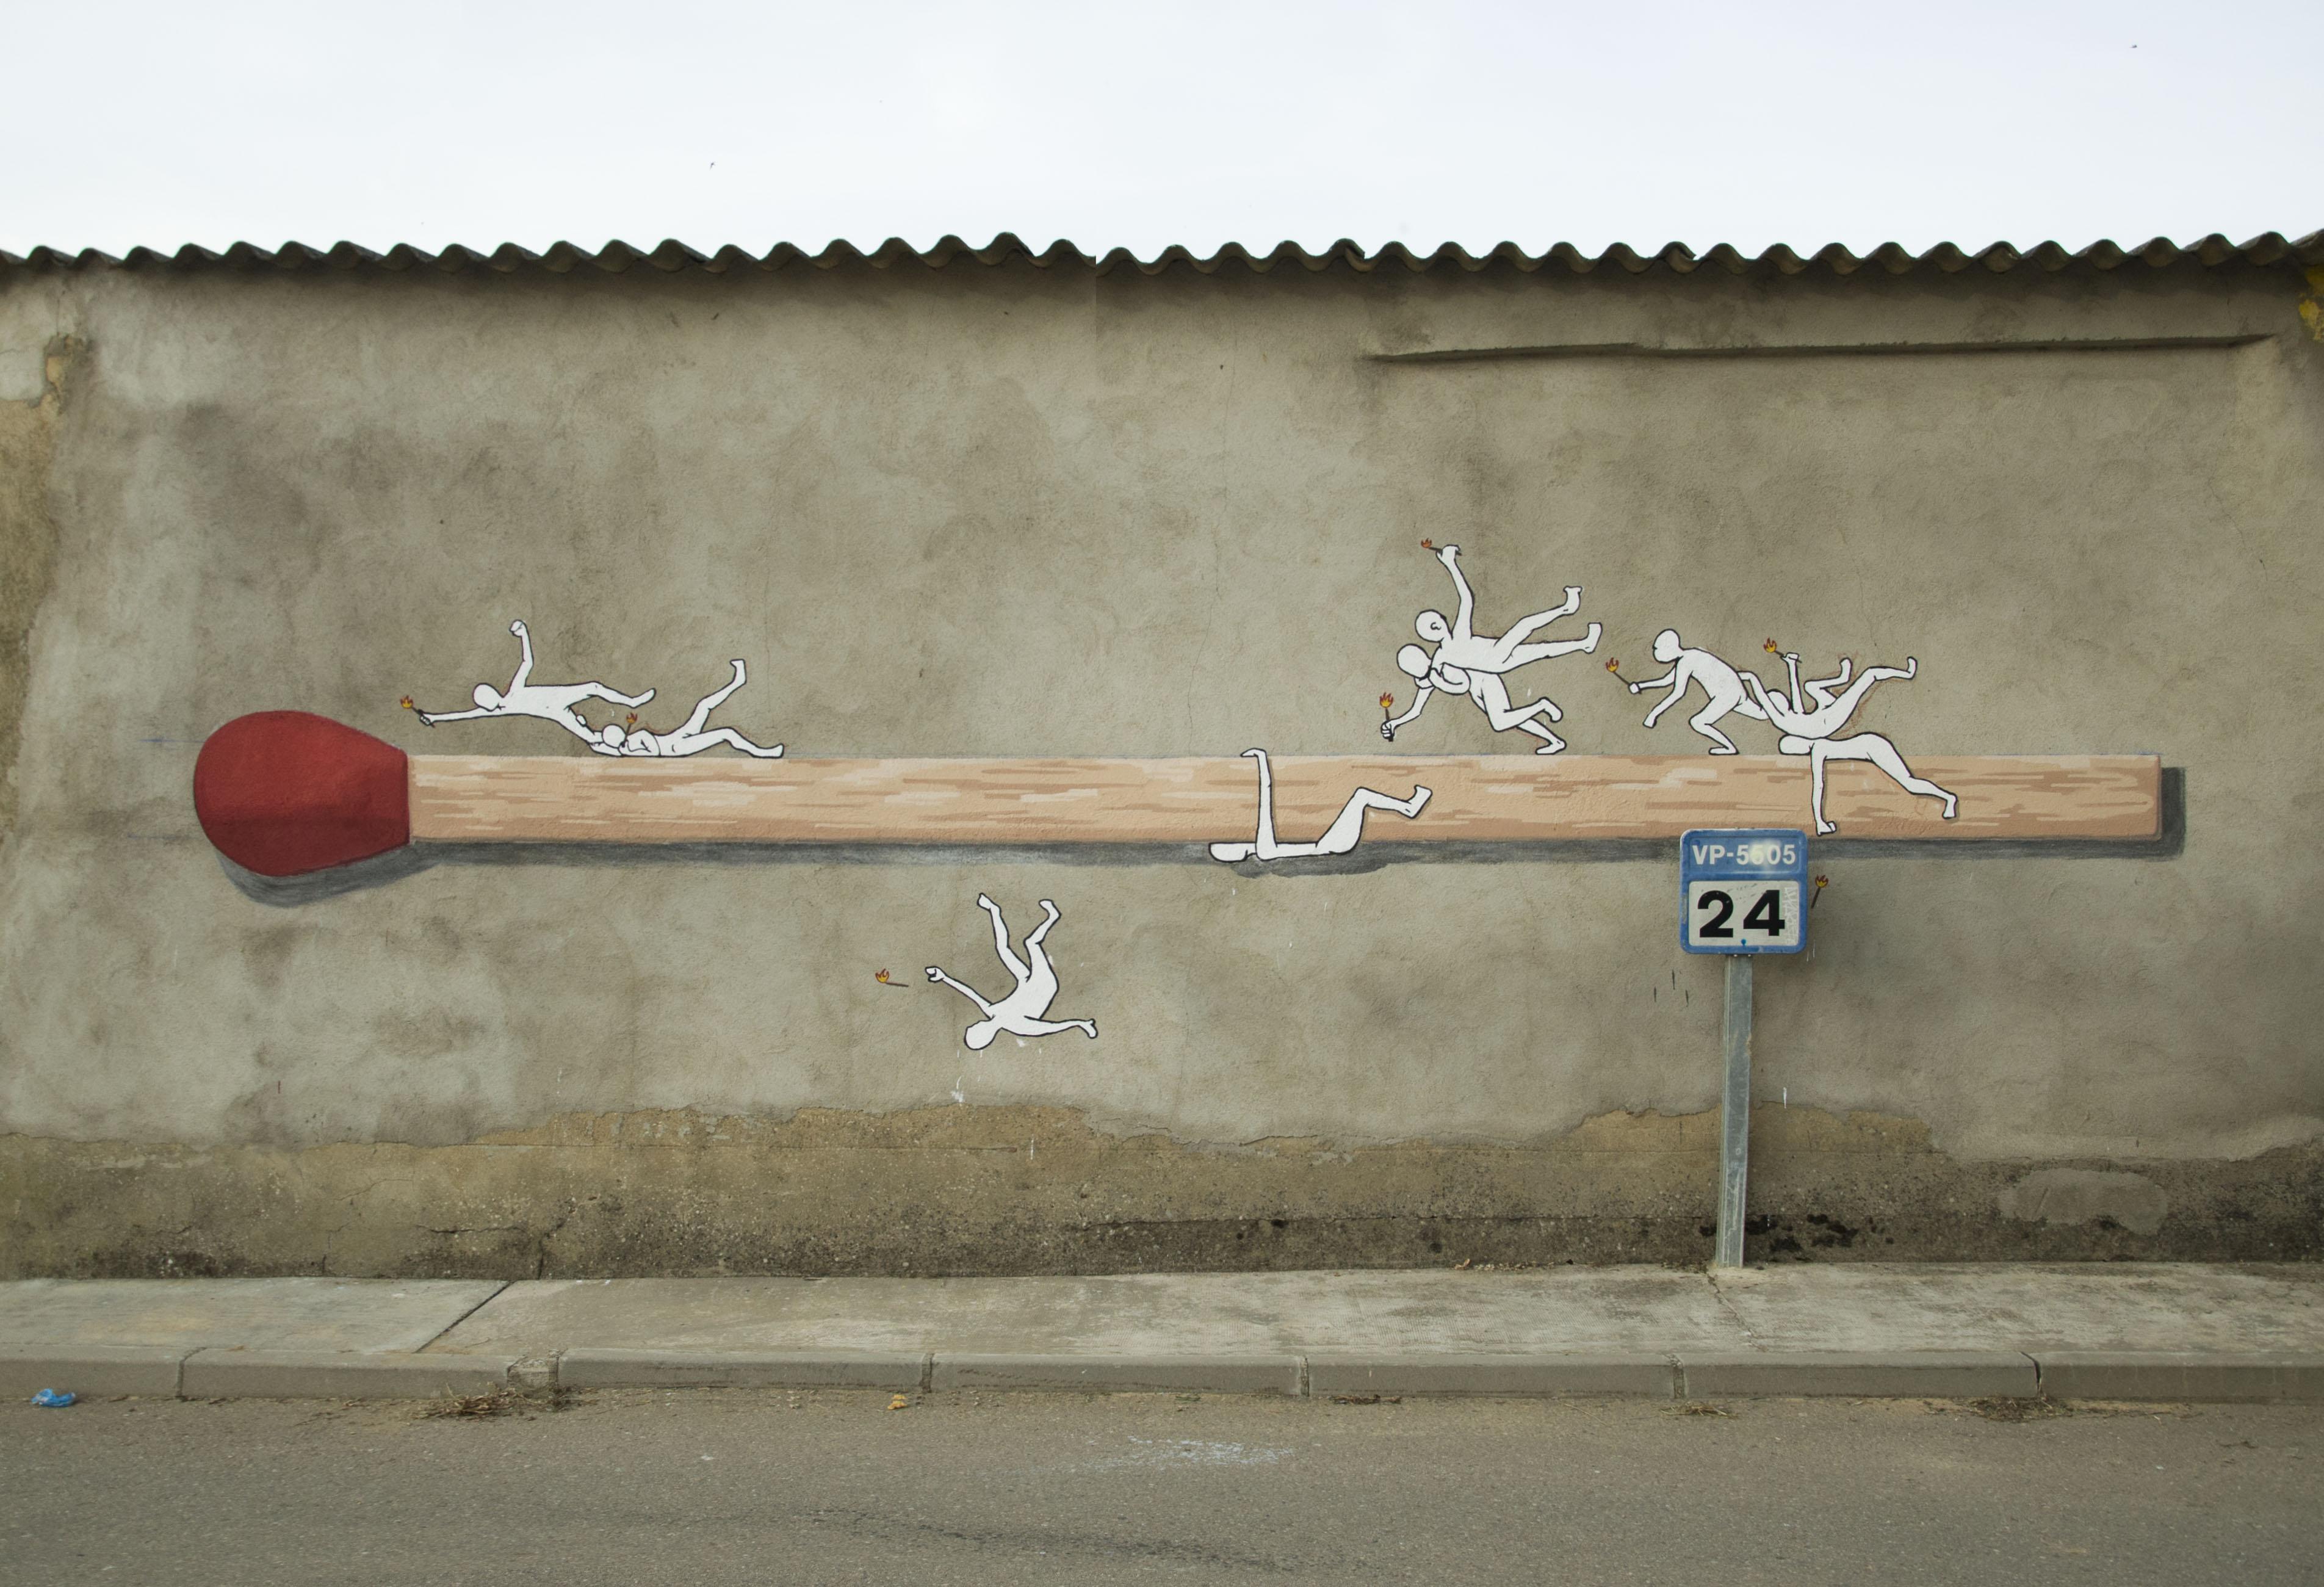 fresque-geante-objet-quotidien-street-art-06